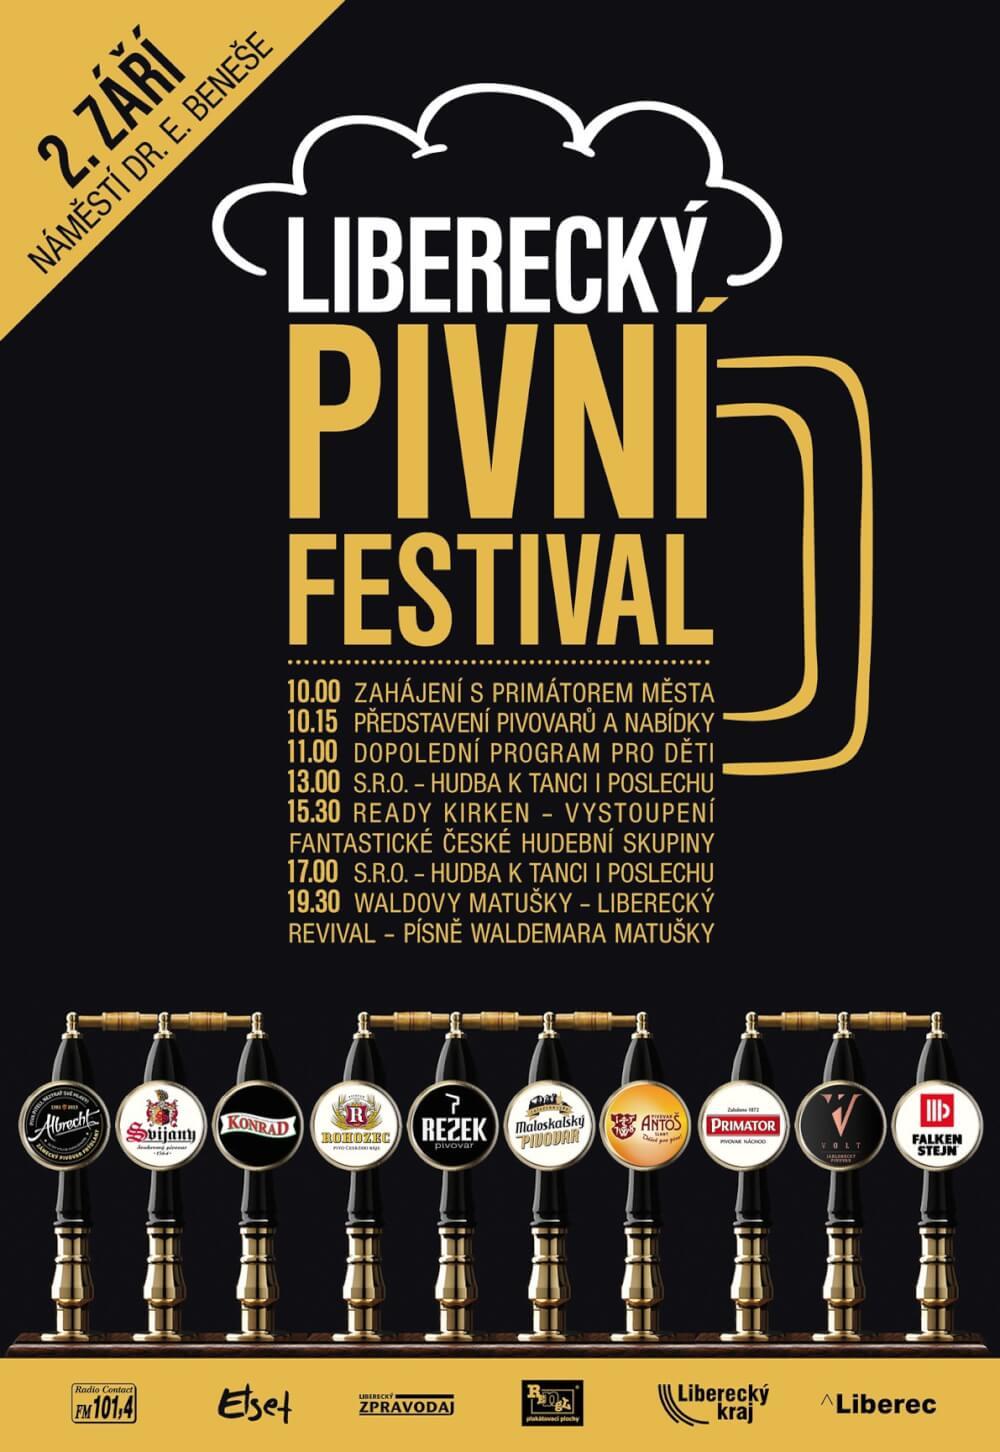 liberecky pivni festival 2017.jpg